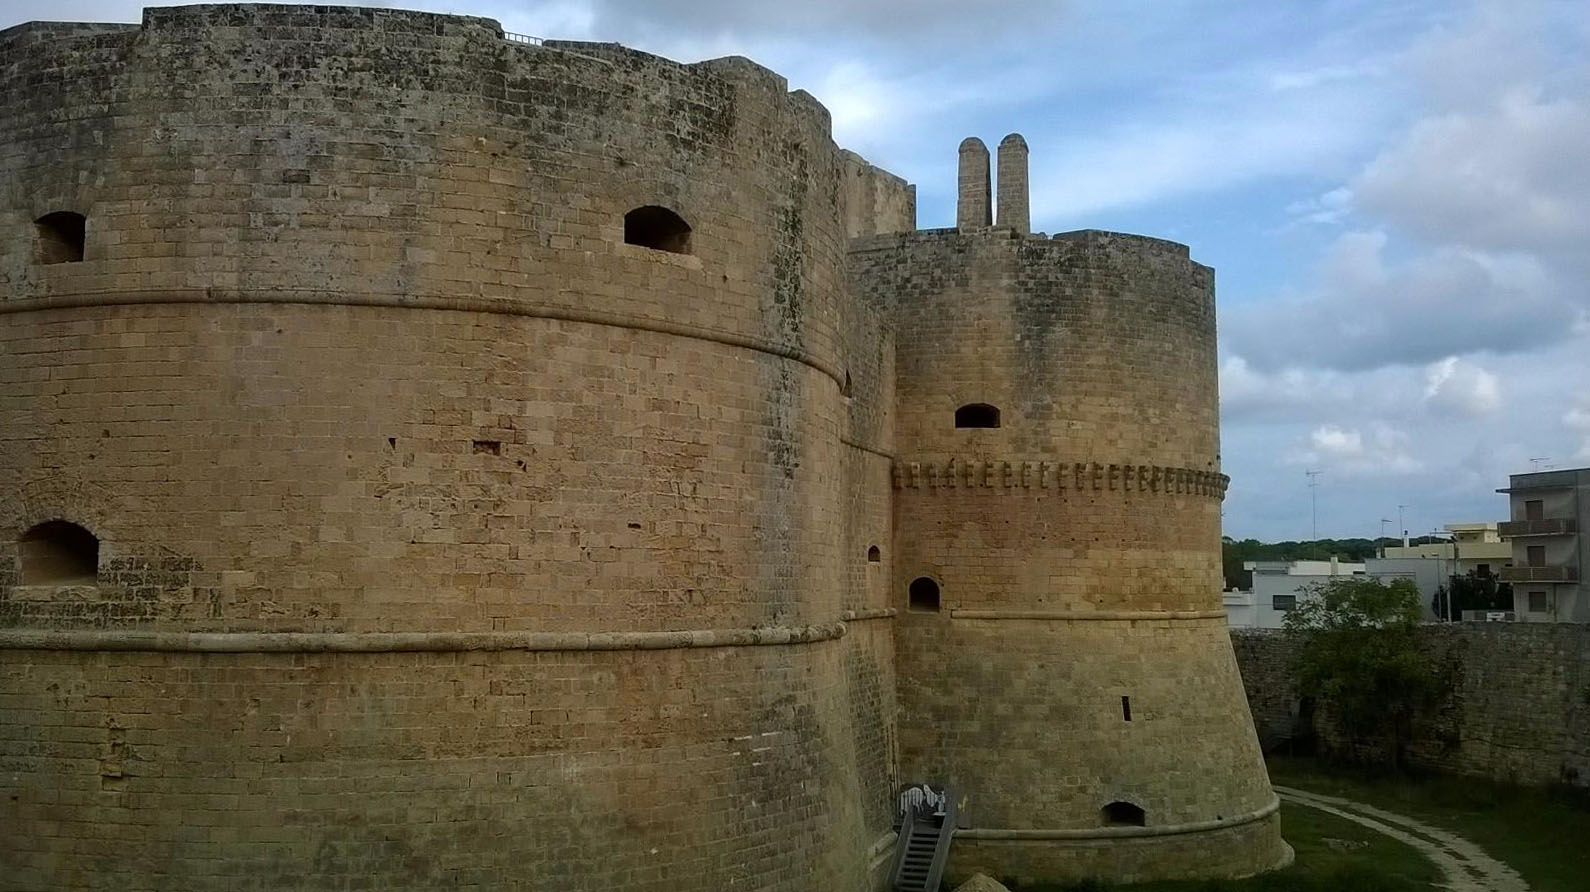 castello-aragonese-otranto